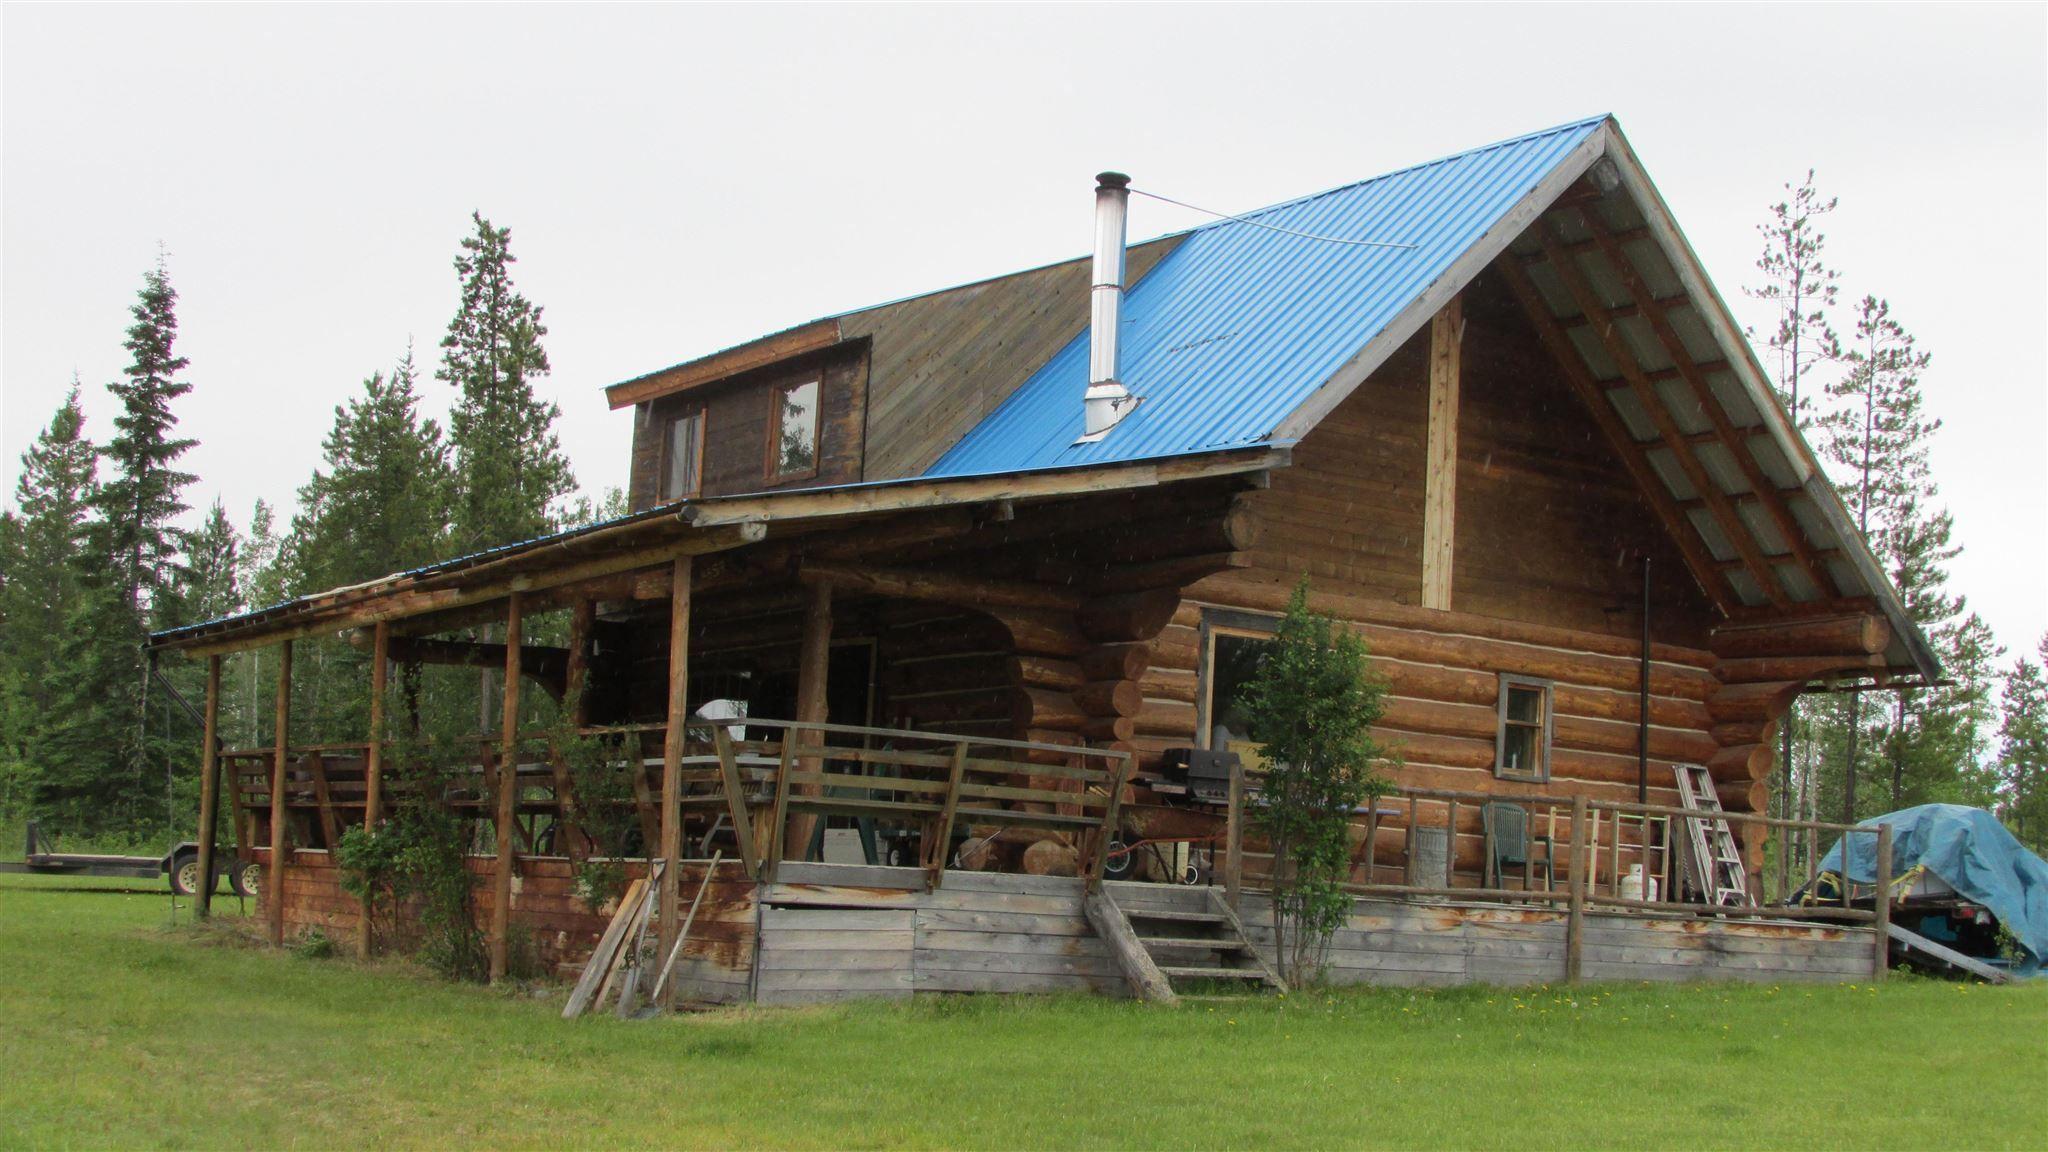 "Main Photo: 4663 RESCHKE Road: Hudsons Hope House for sale in ""LYNX CREEK SUBDIVISION"" (Fort St. John (Zone 60))  : MLS®# R2594975"